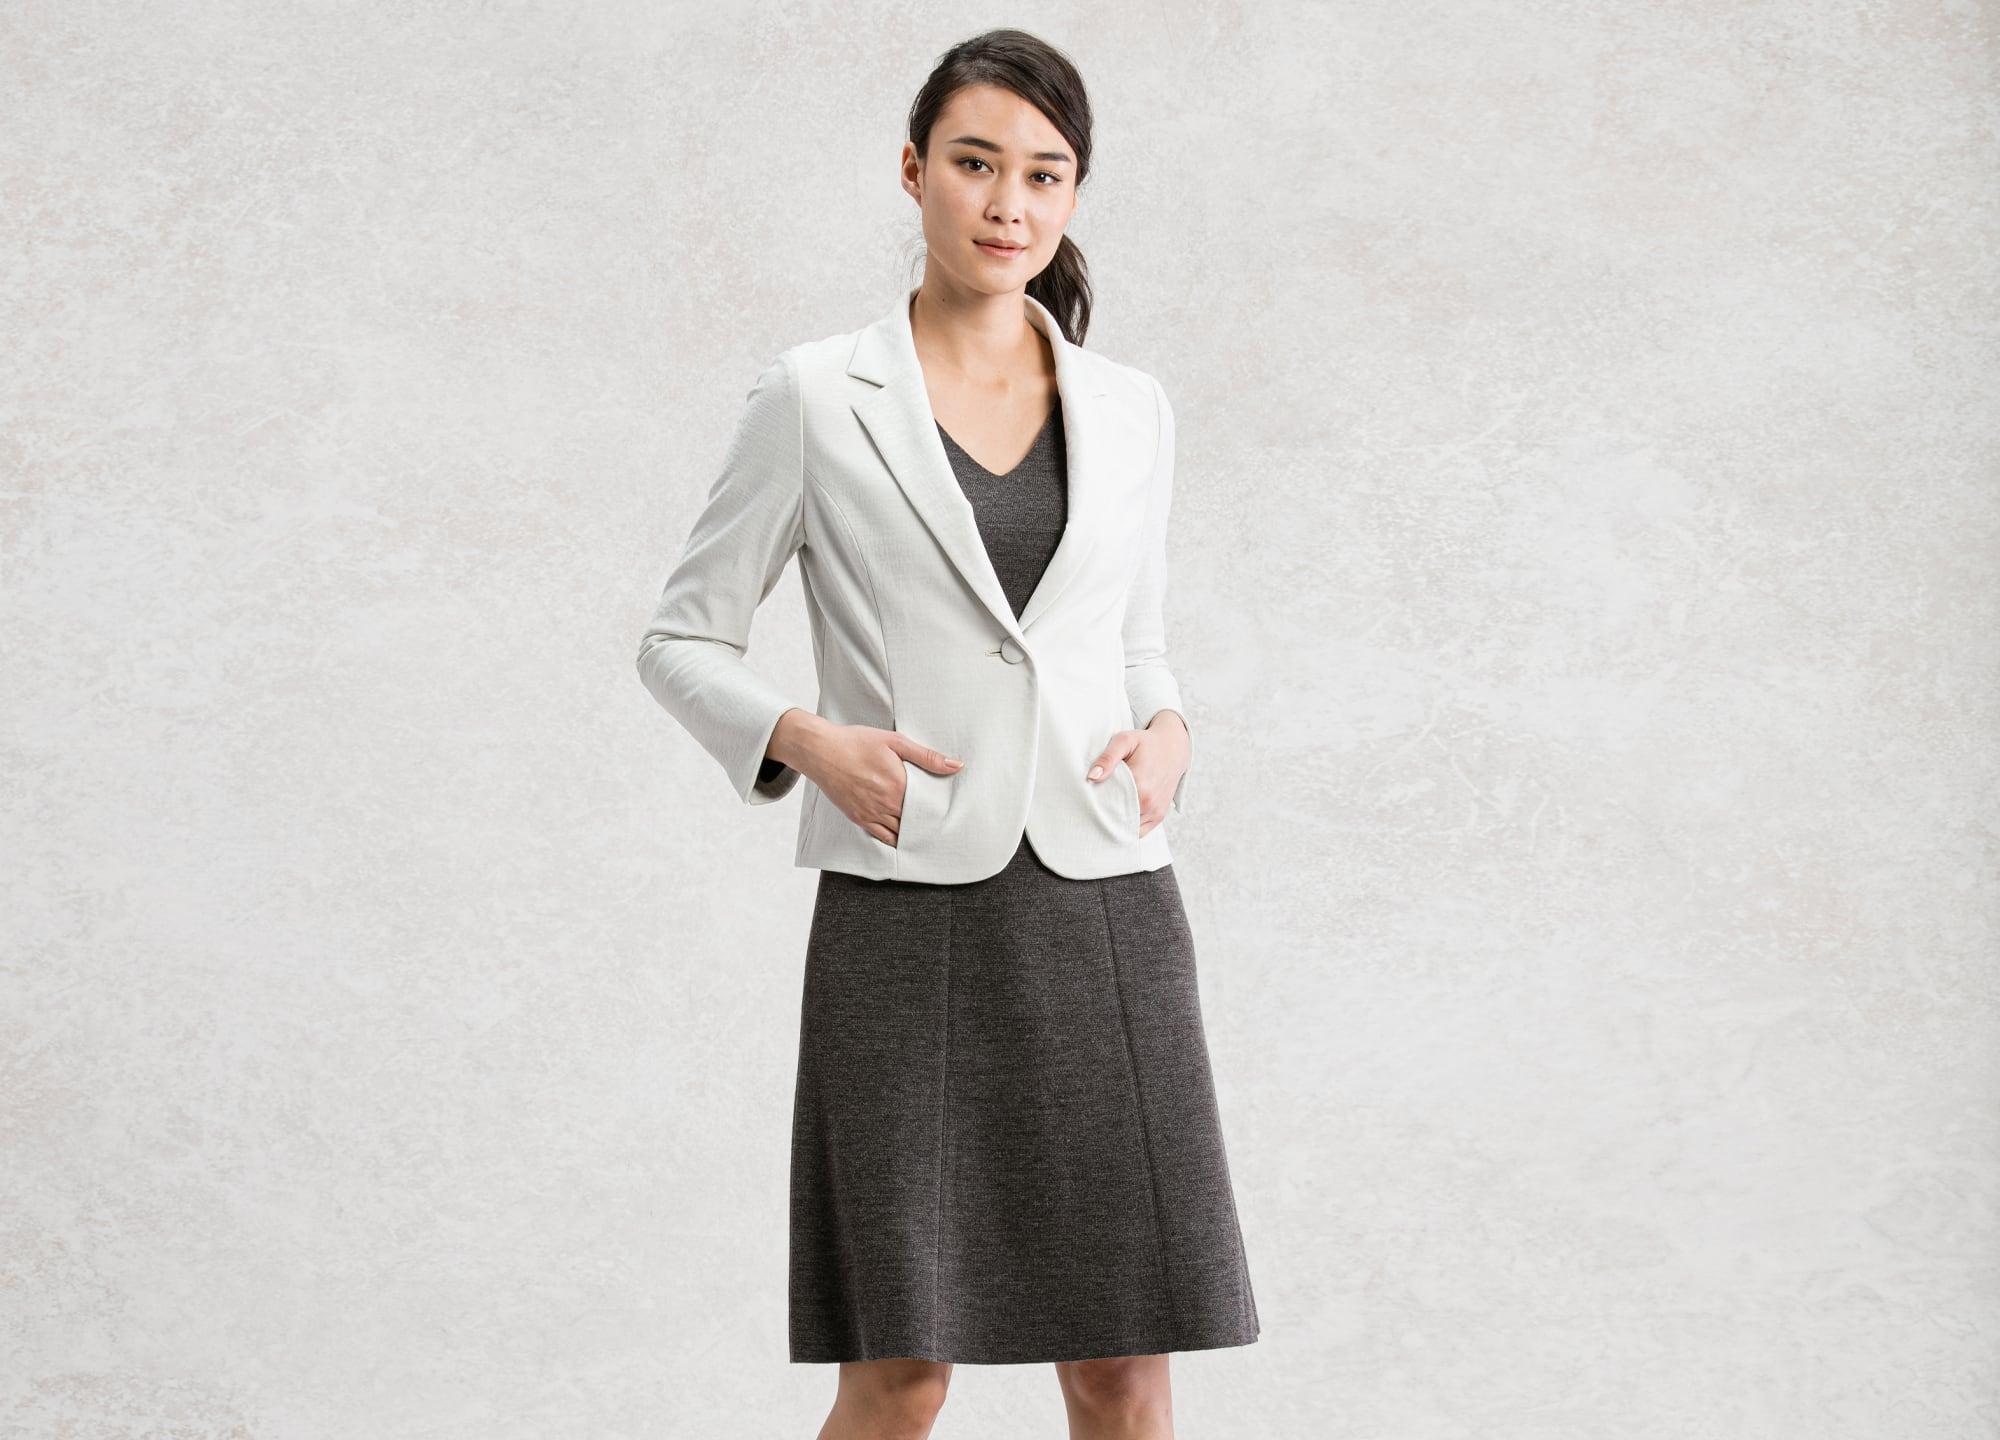 Coordinate_3_Greige_Tailored_Jacket.jpg